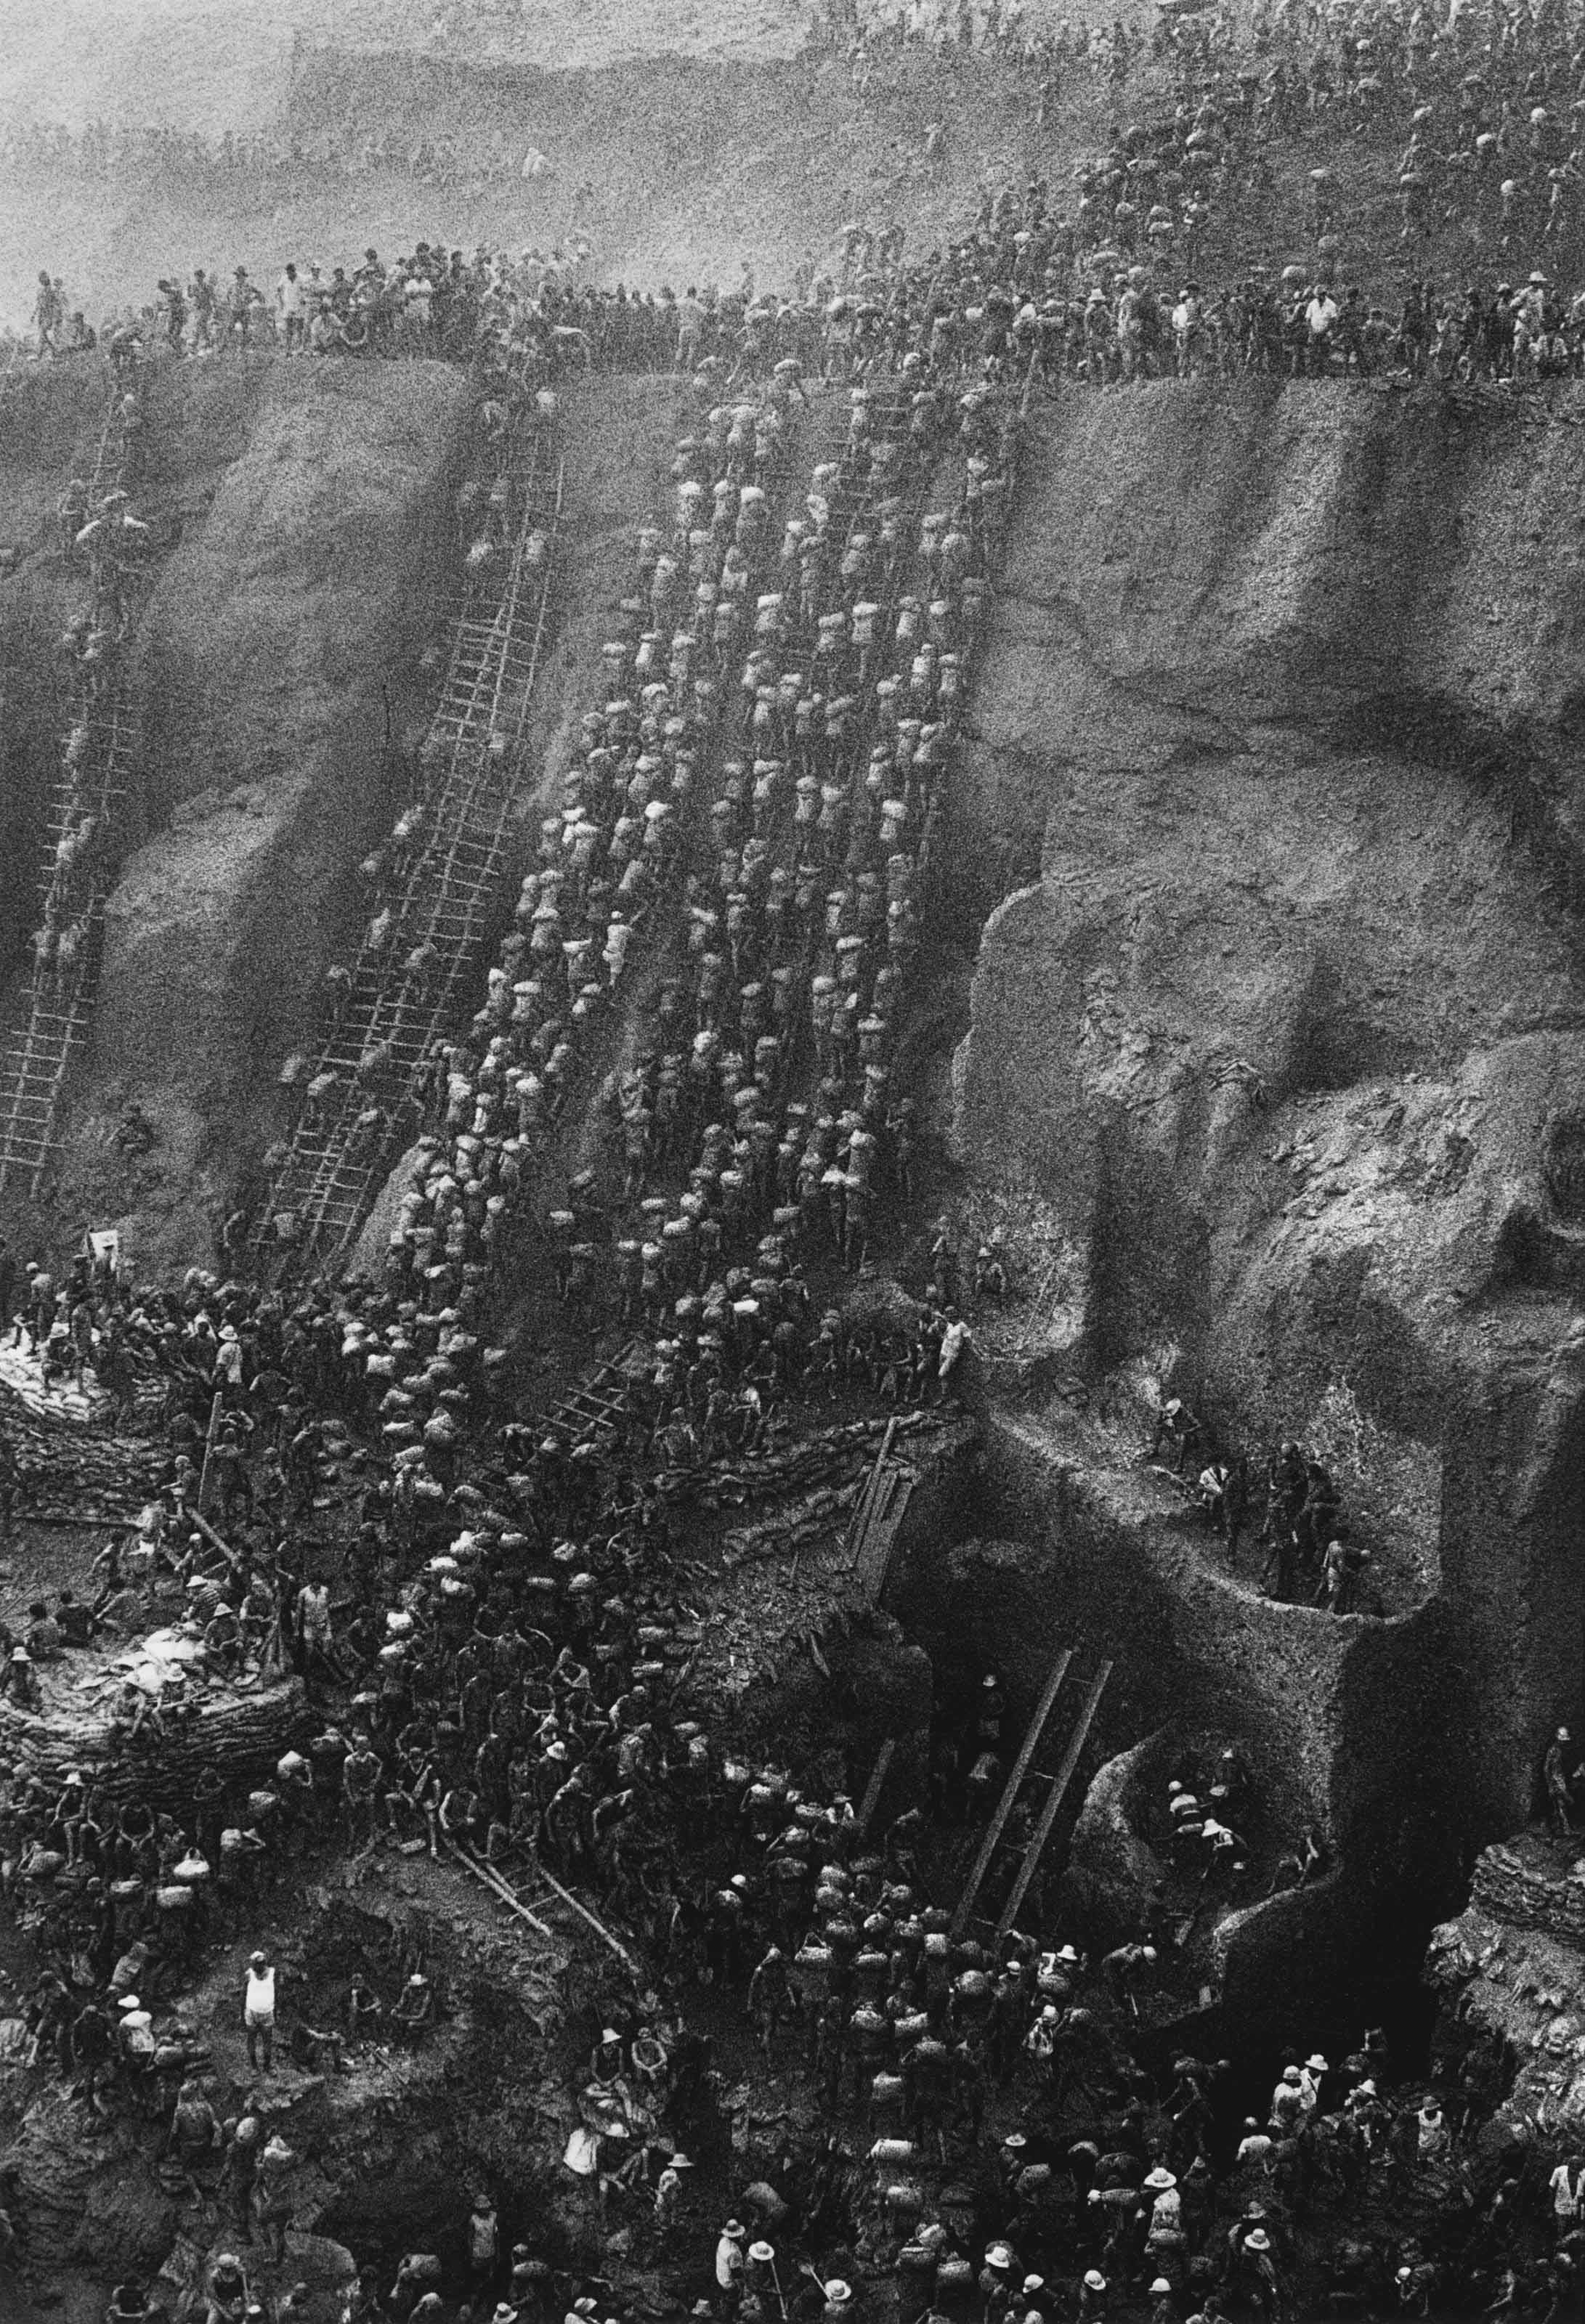 Serra Pelada goldmine, Brazil, 1986